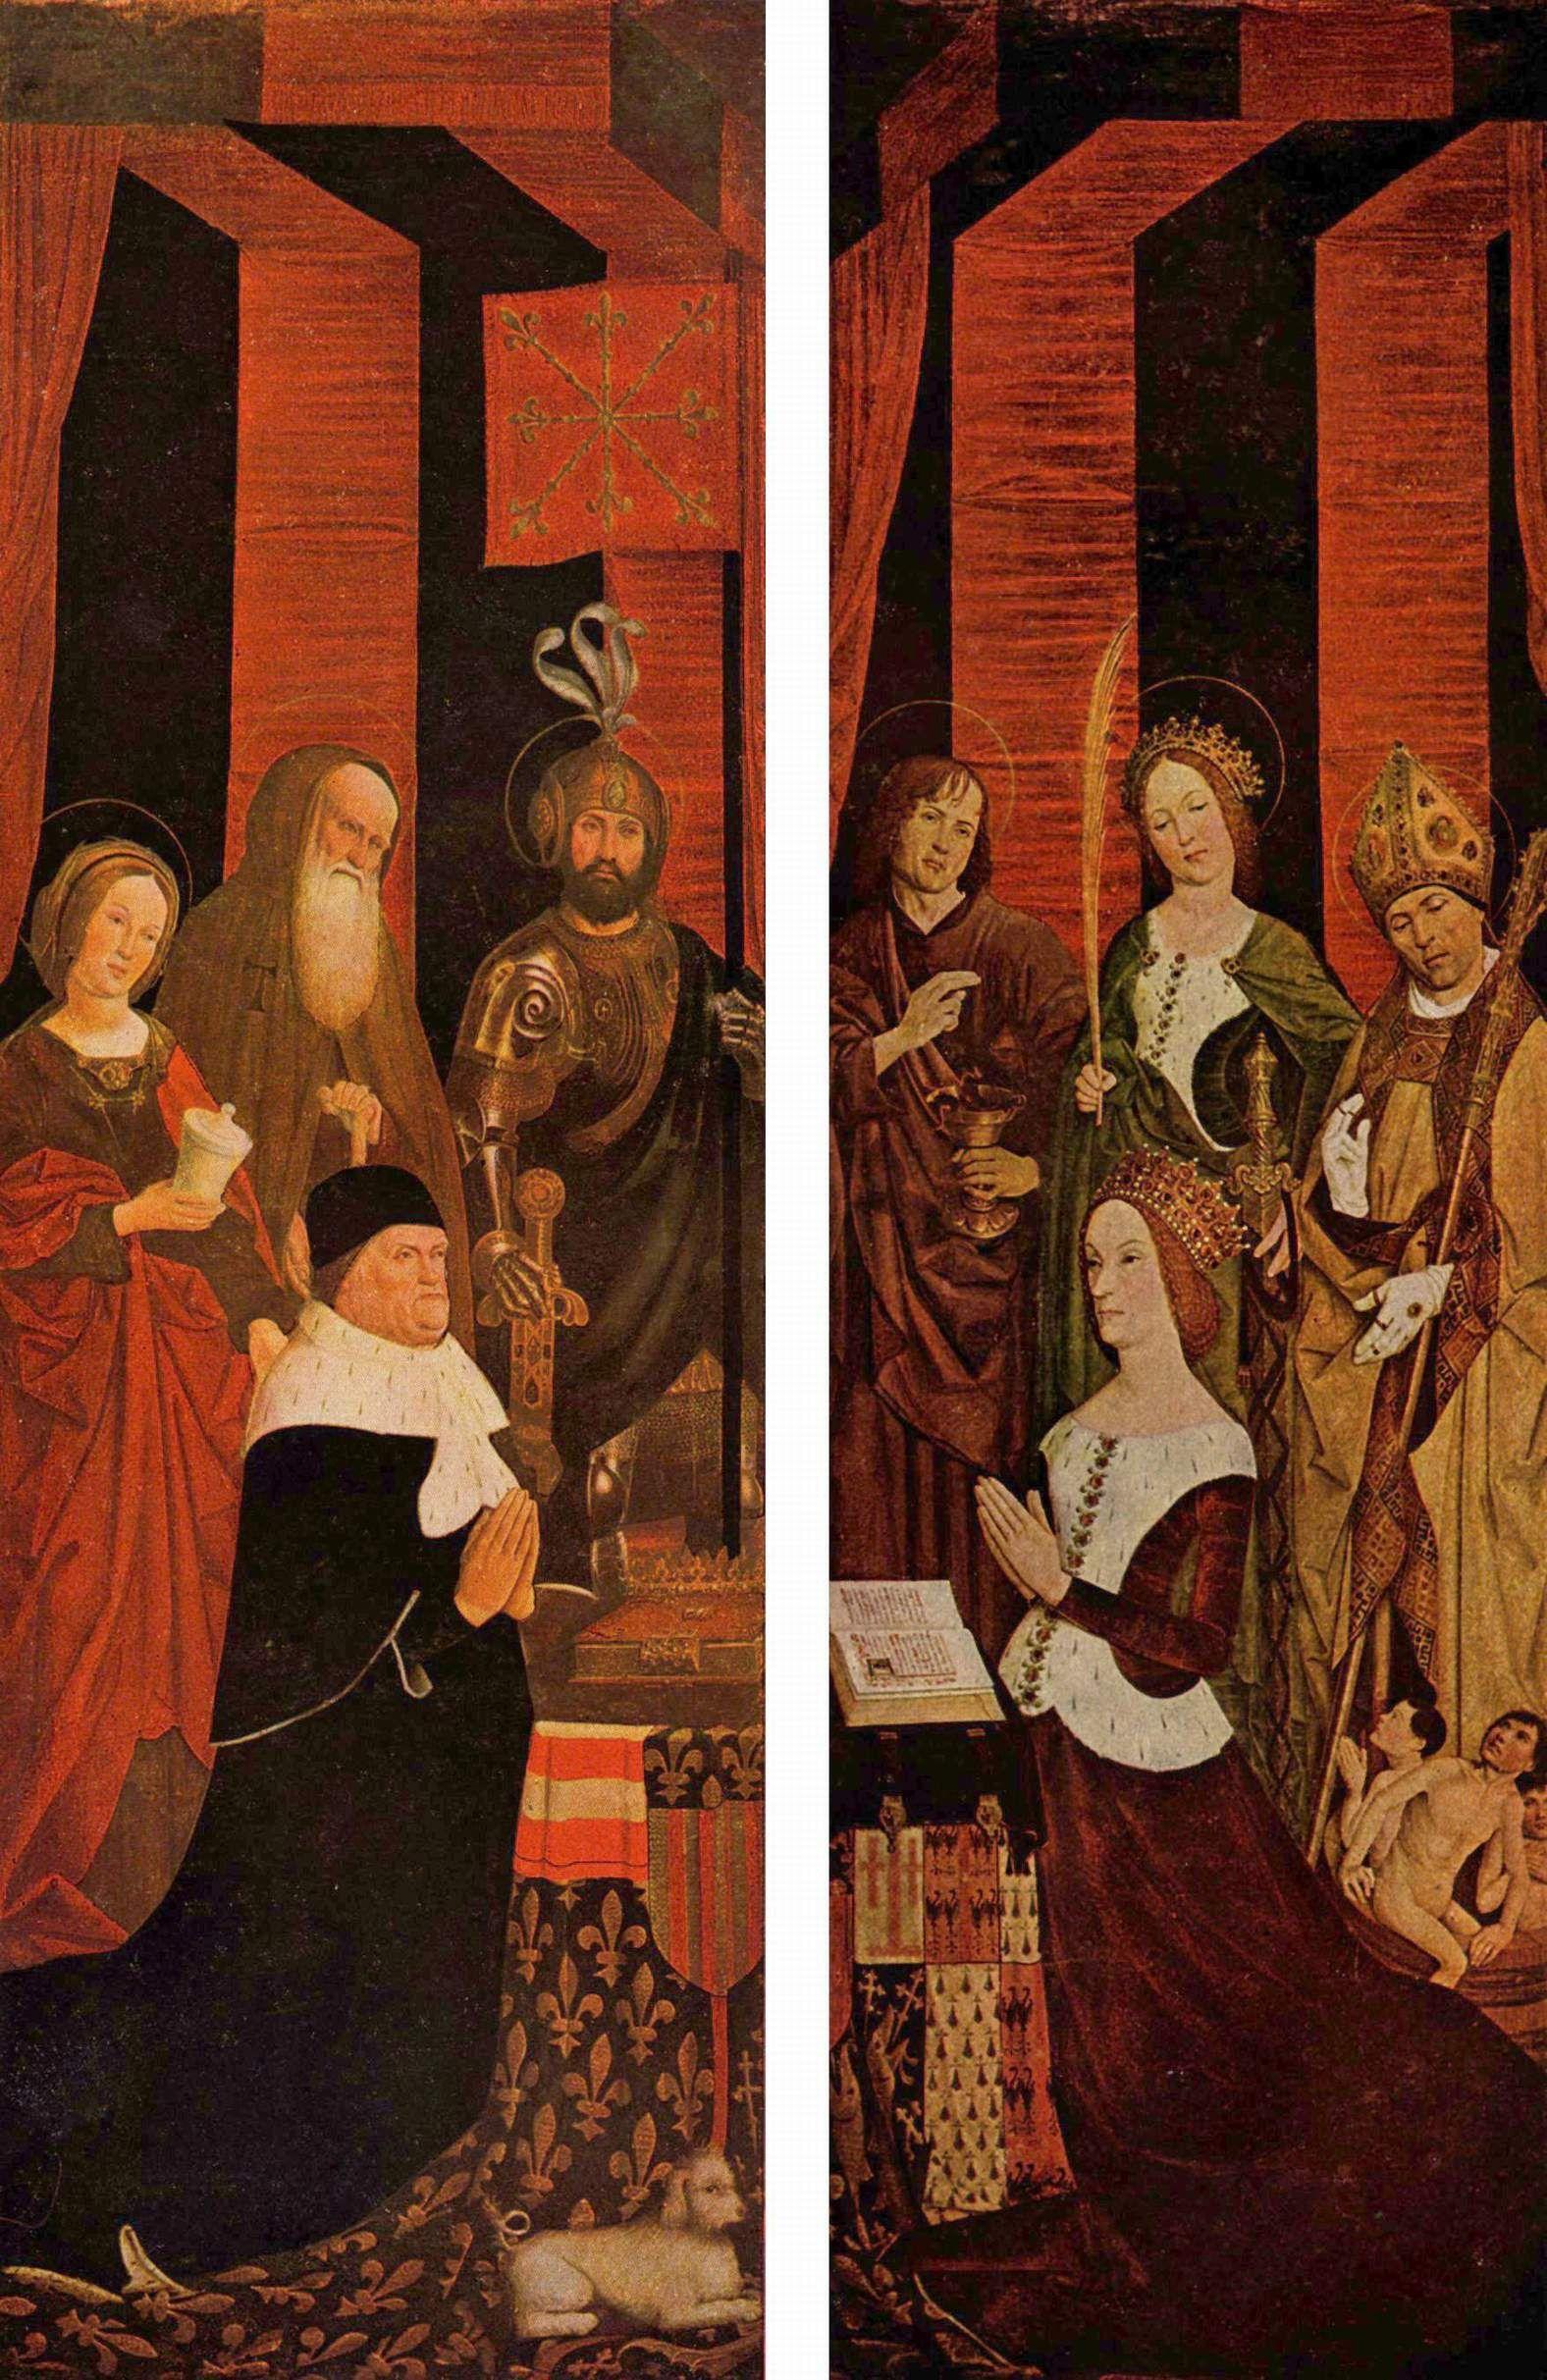 Pin On Miscelána Artística Pintura